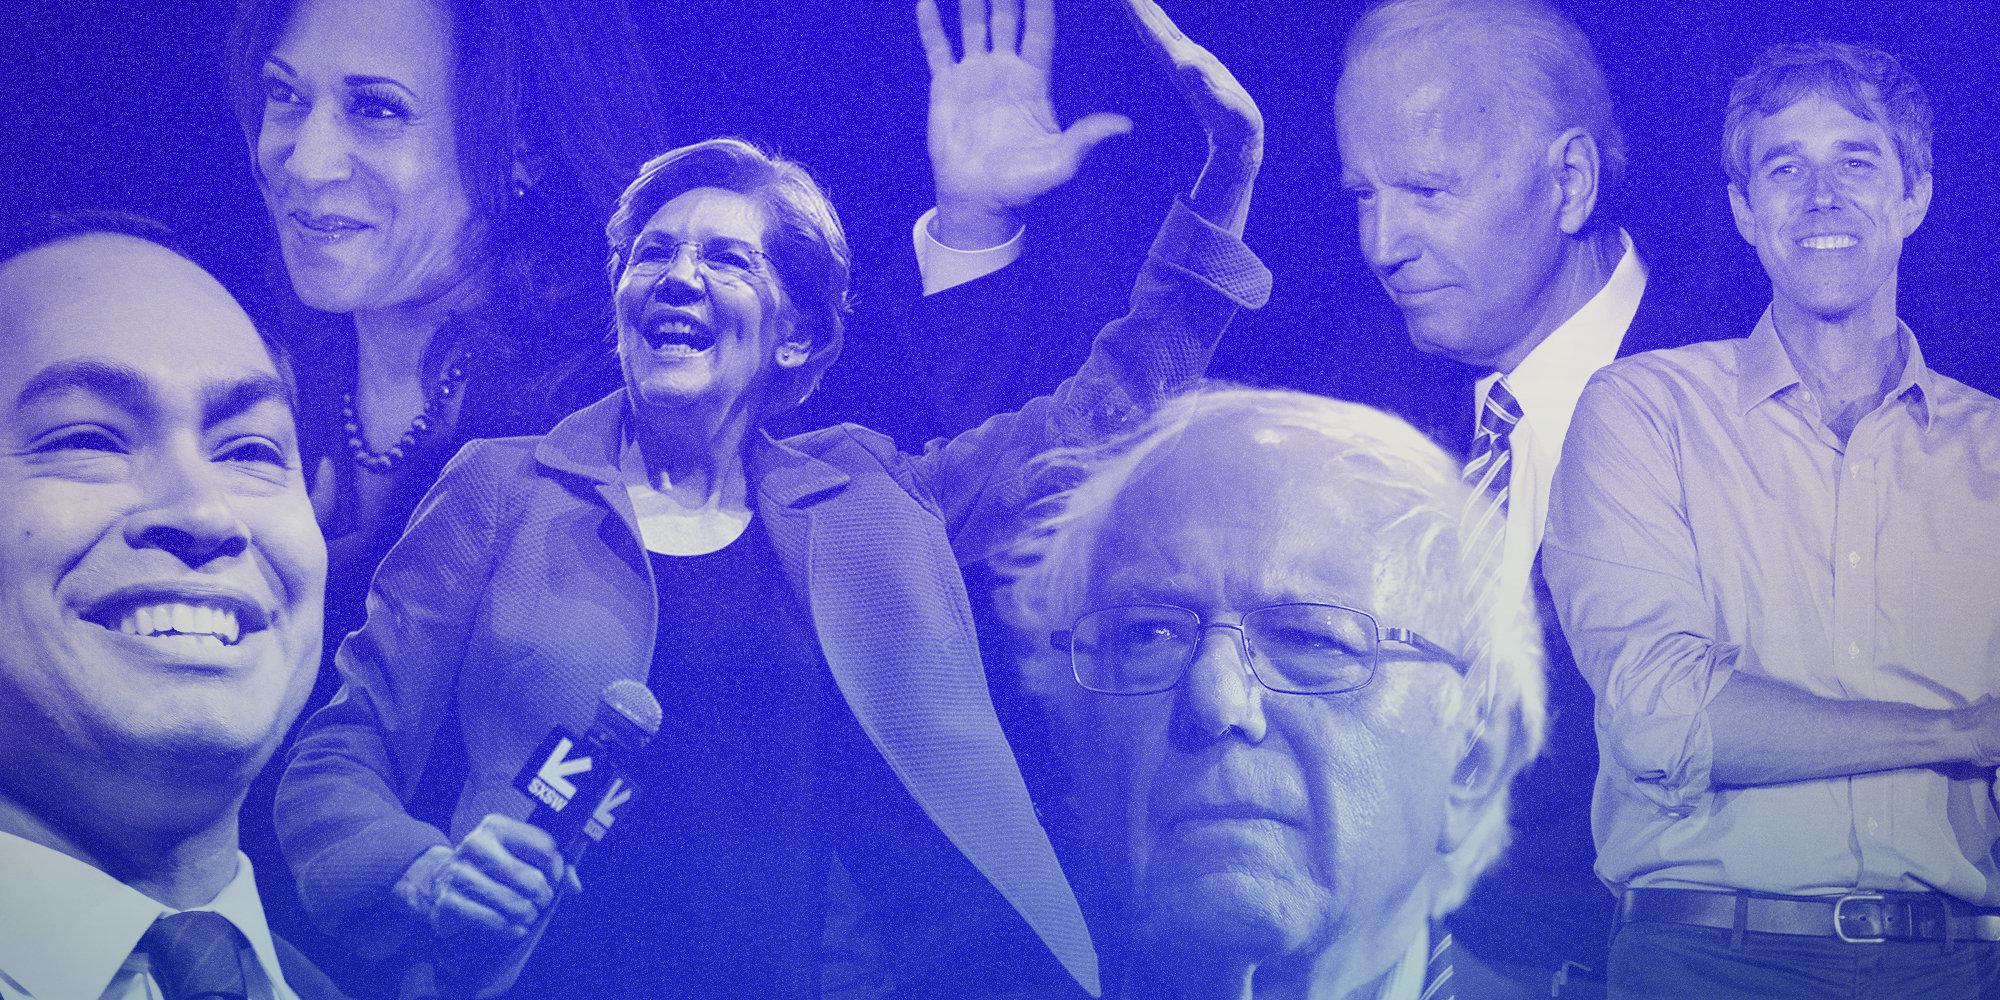 every 2020 democrat wants